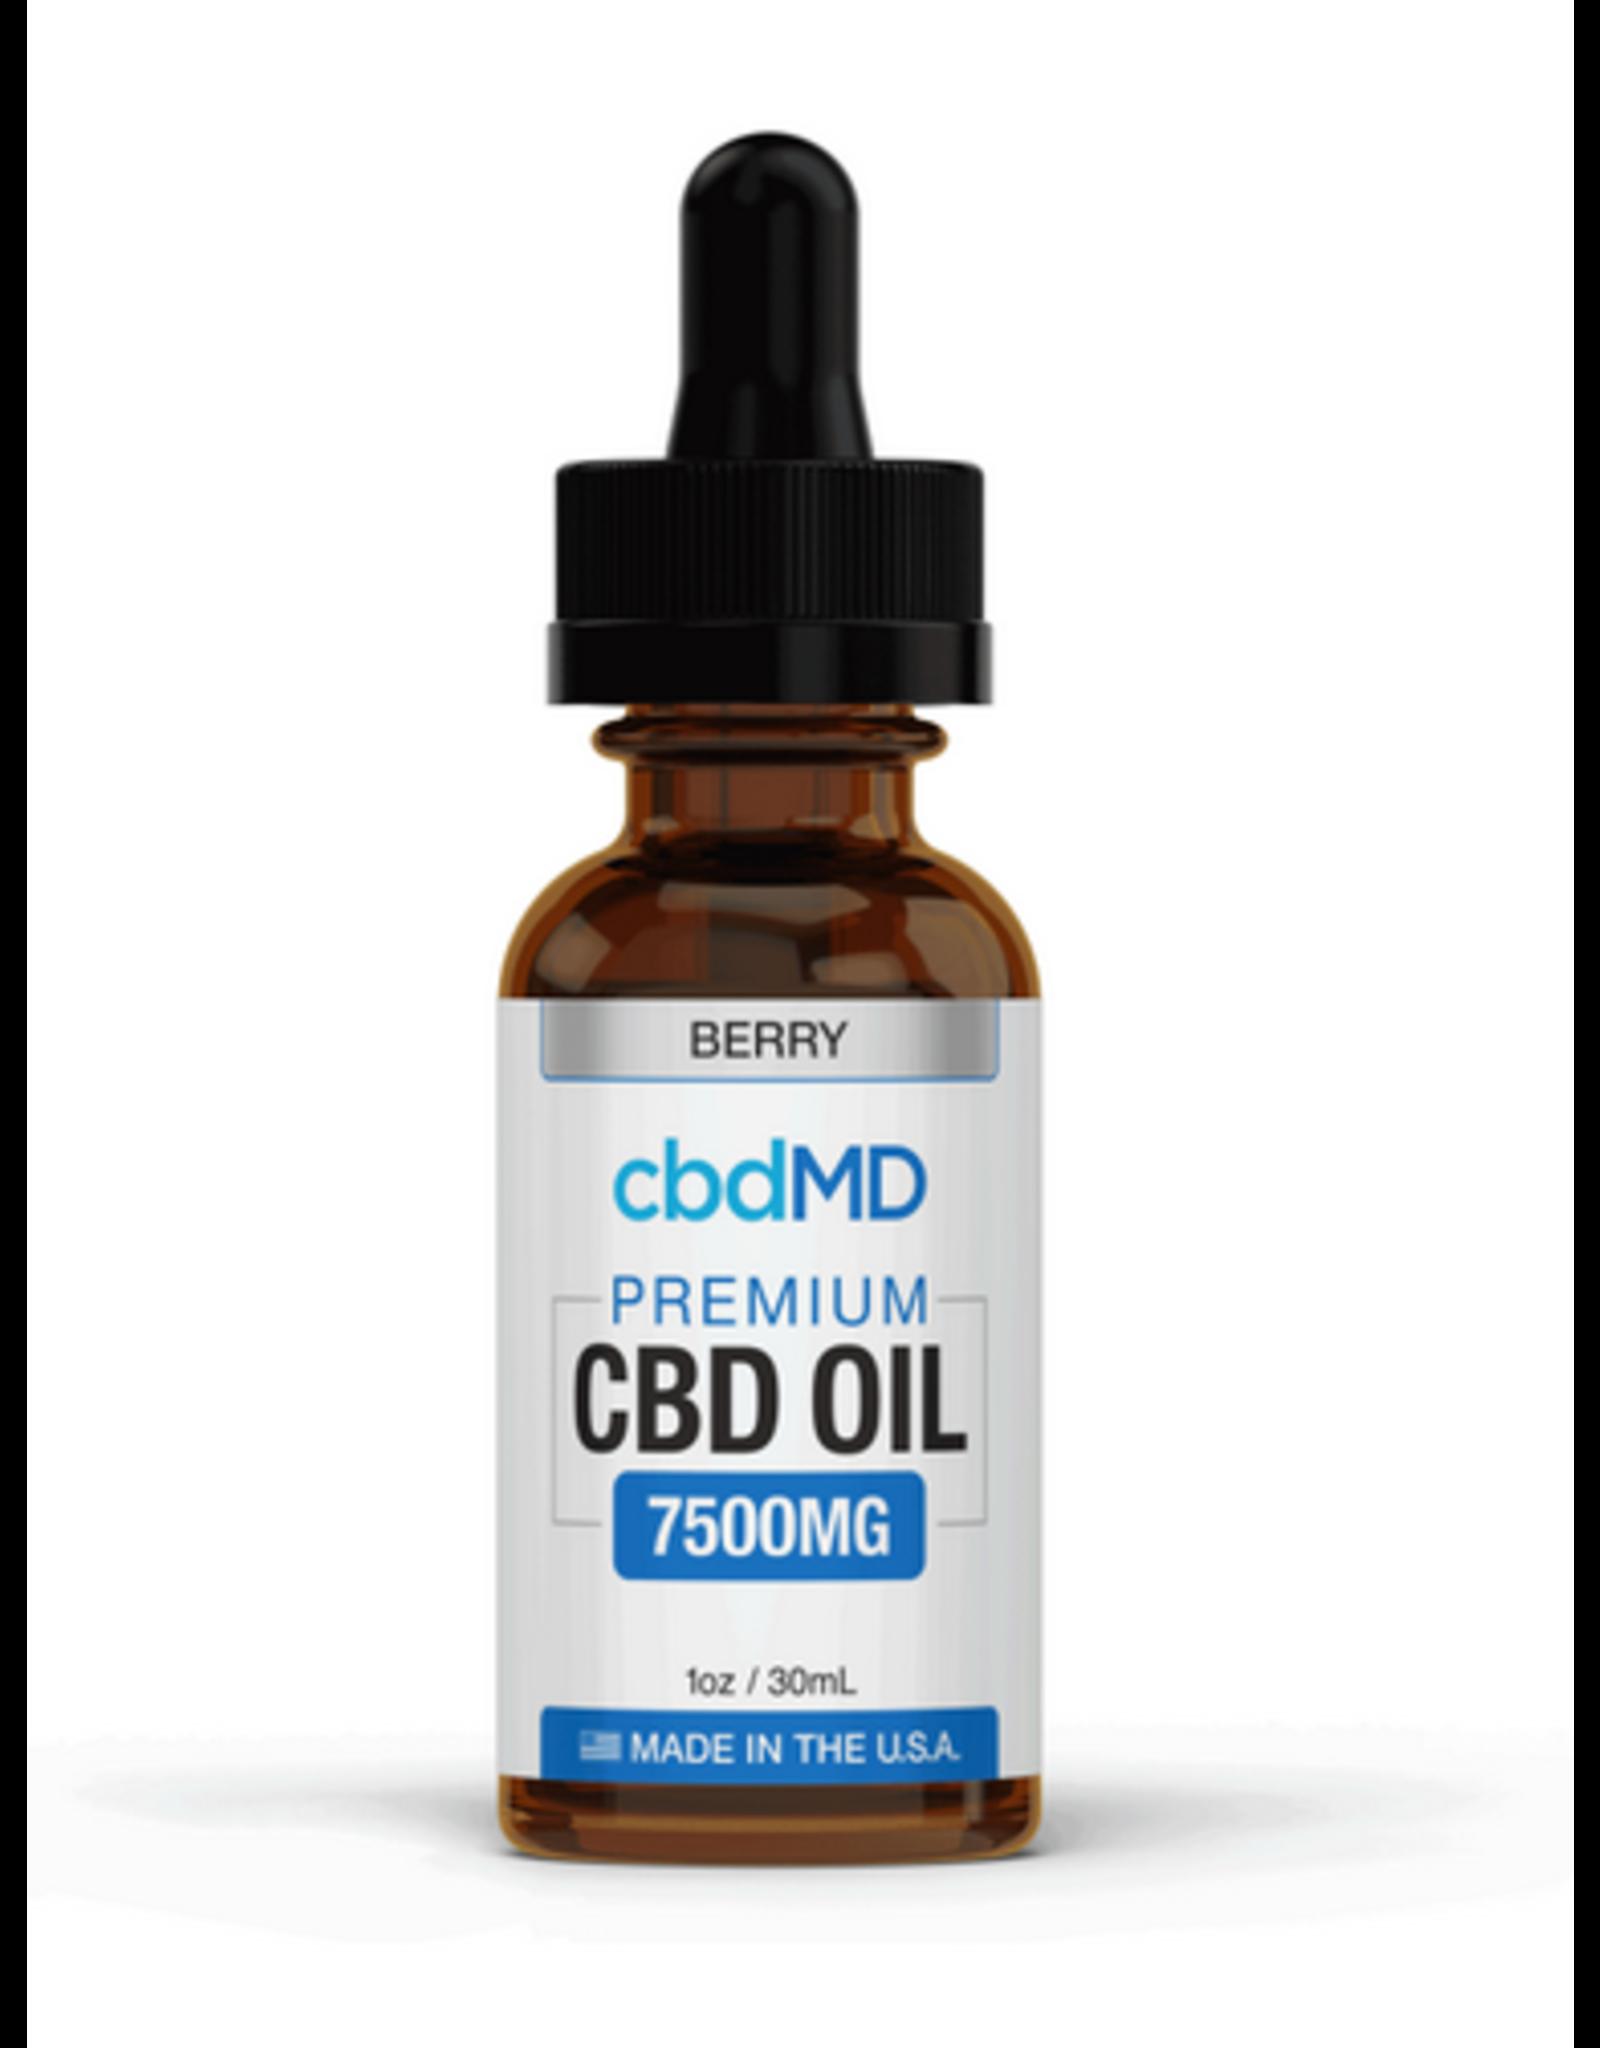 CBD MD Cbd md 7500 berry oil